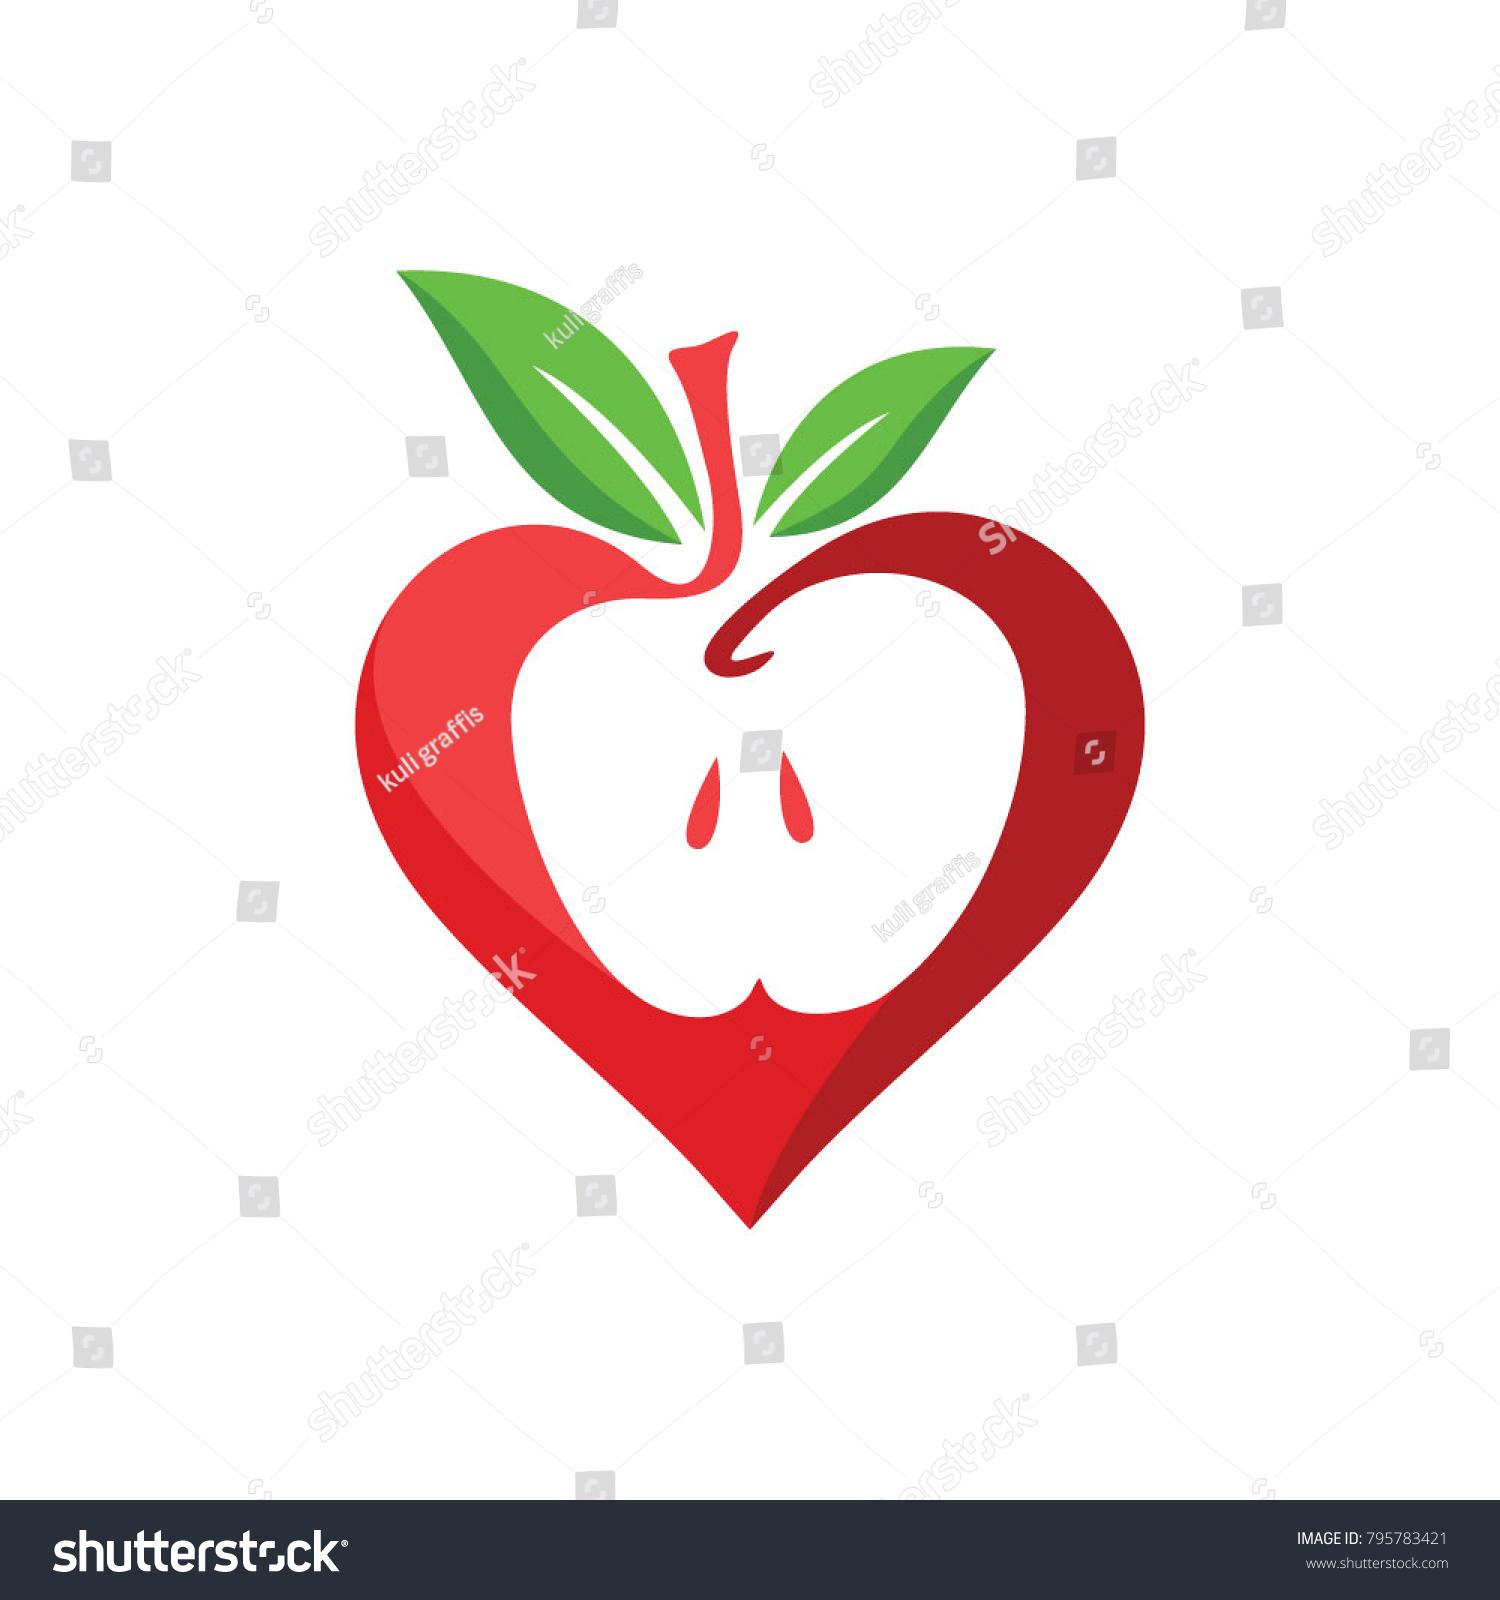 Apple love logo vector stock vector 795783421 shutterstock apple love logo vector biocorpaavc